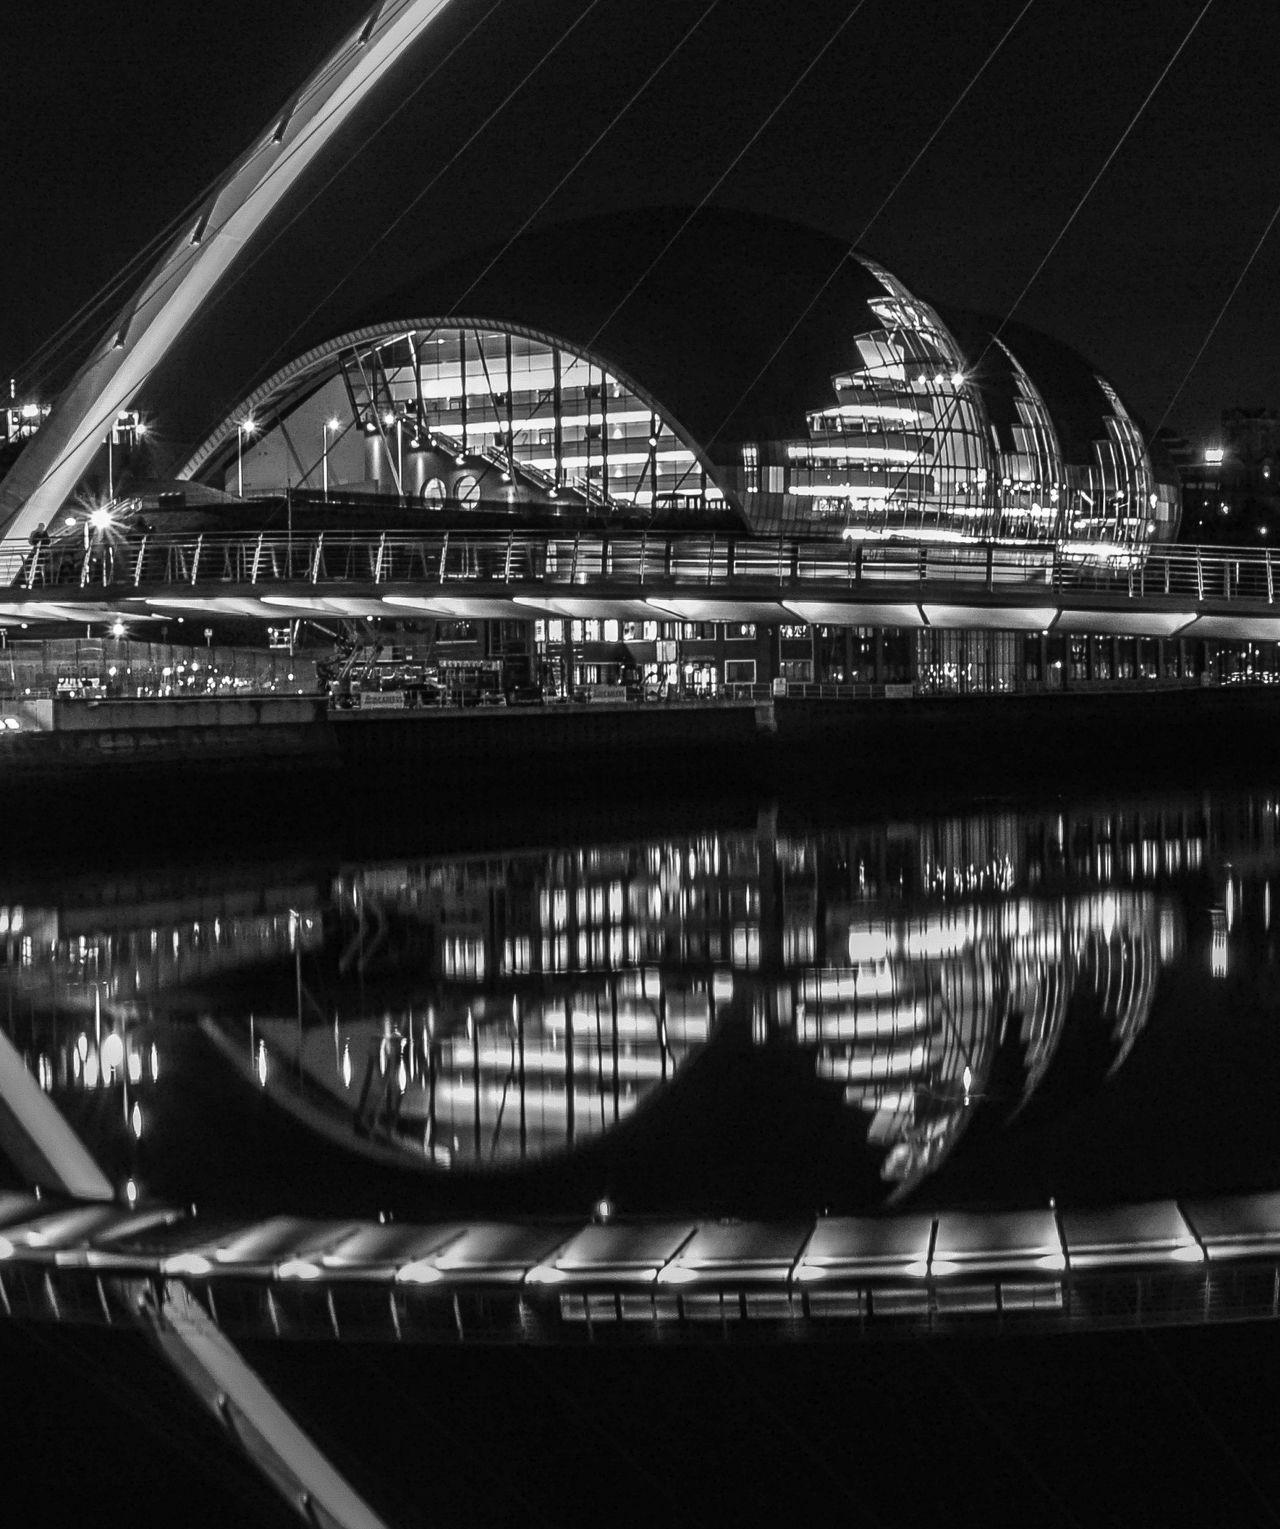 Quayside reflections Gateshead Iconic Buildings Long Exposure Millenium Bridge Mono Newcastle Night Scene Serene The Sage First Eyeem Photo